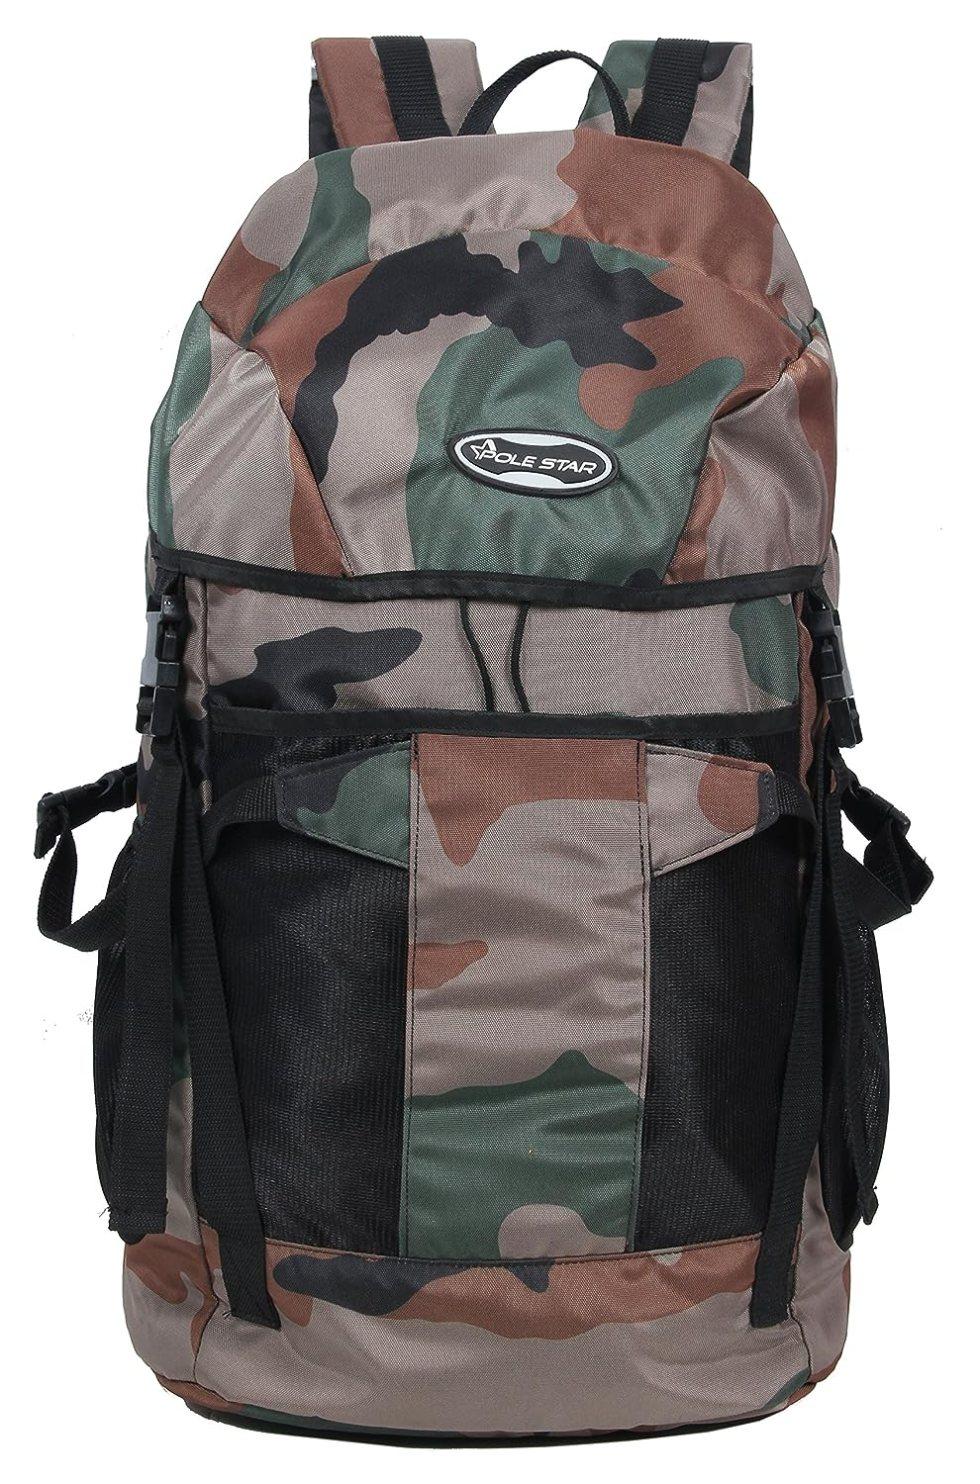 Rocky Polyester Travel Bag 44 Lt military Weekend Backpack Bag